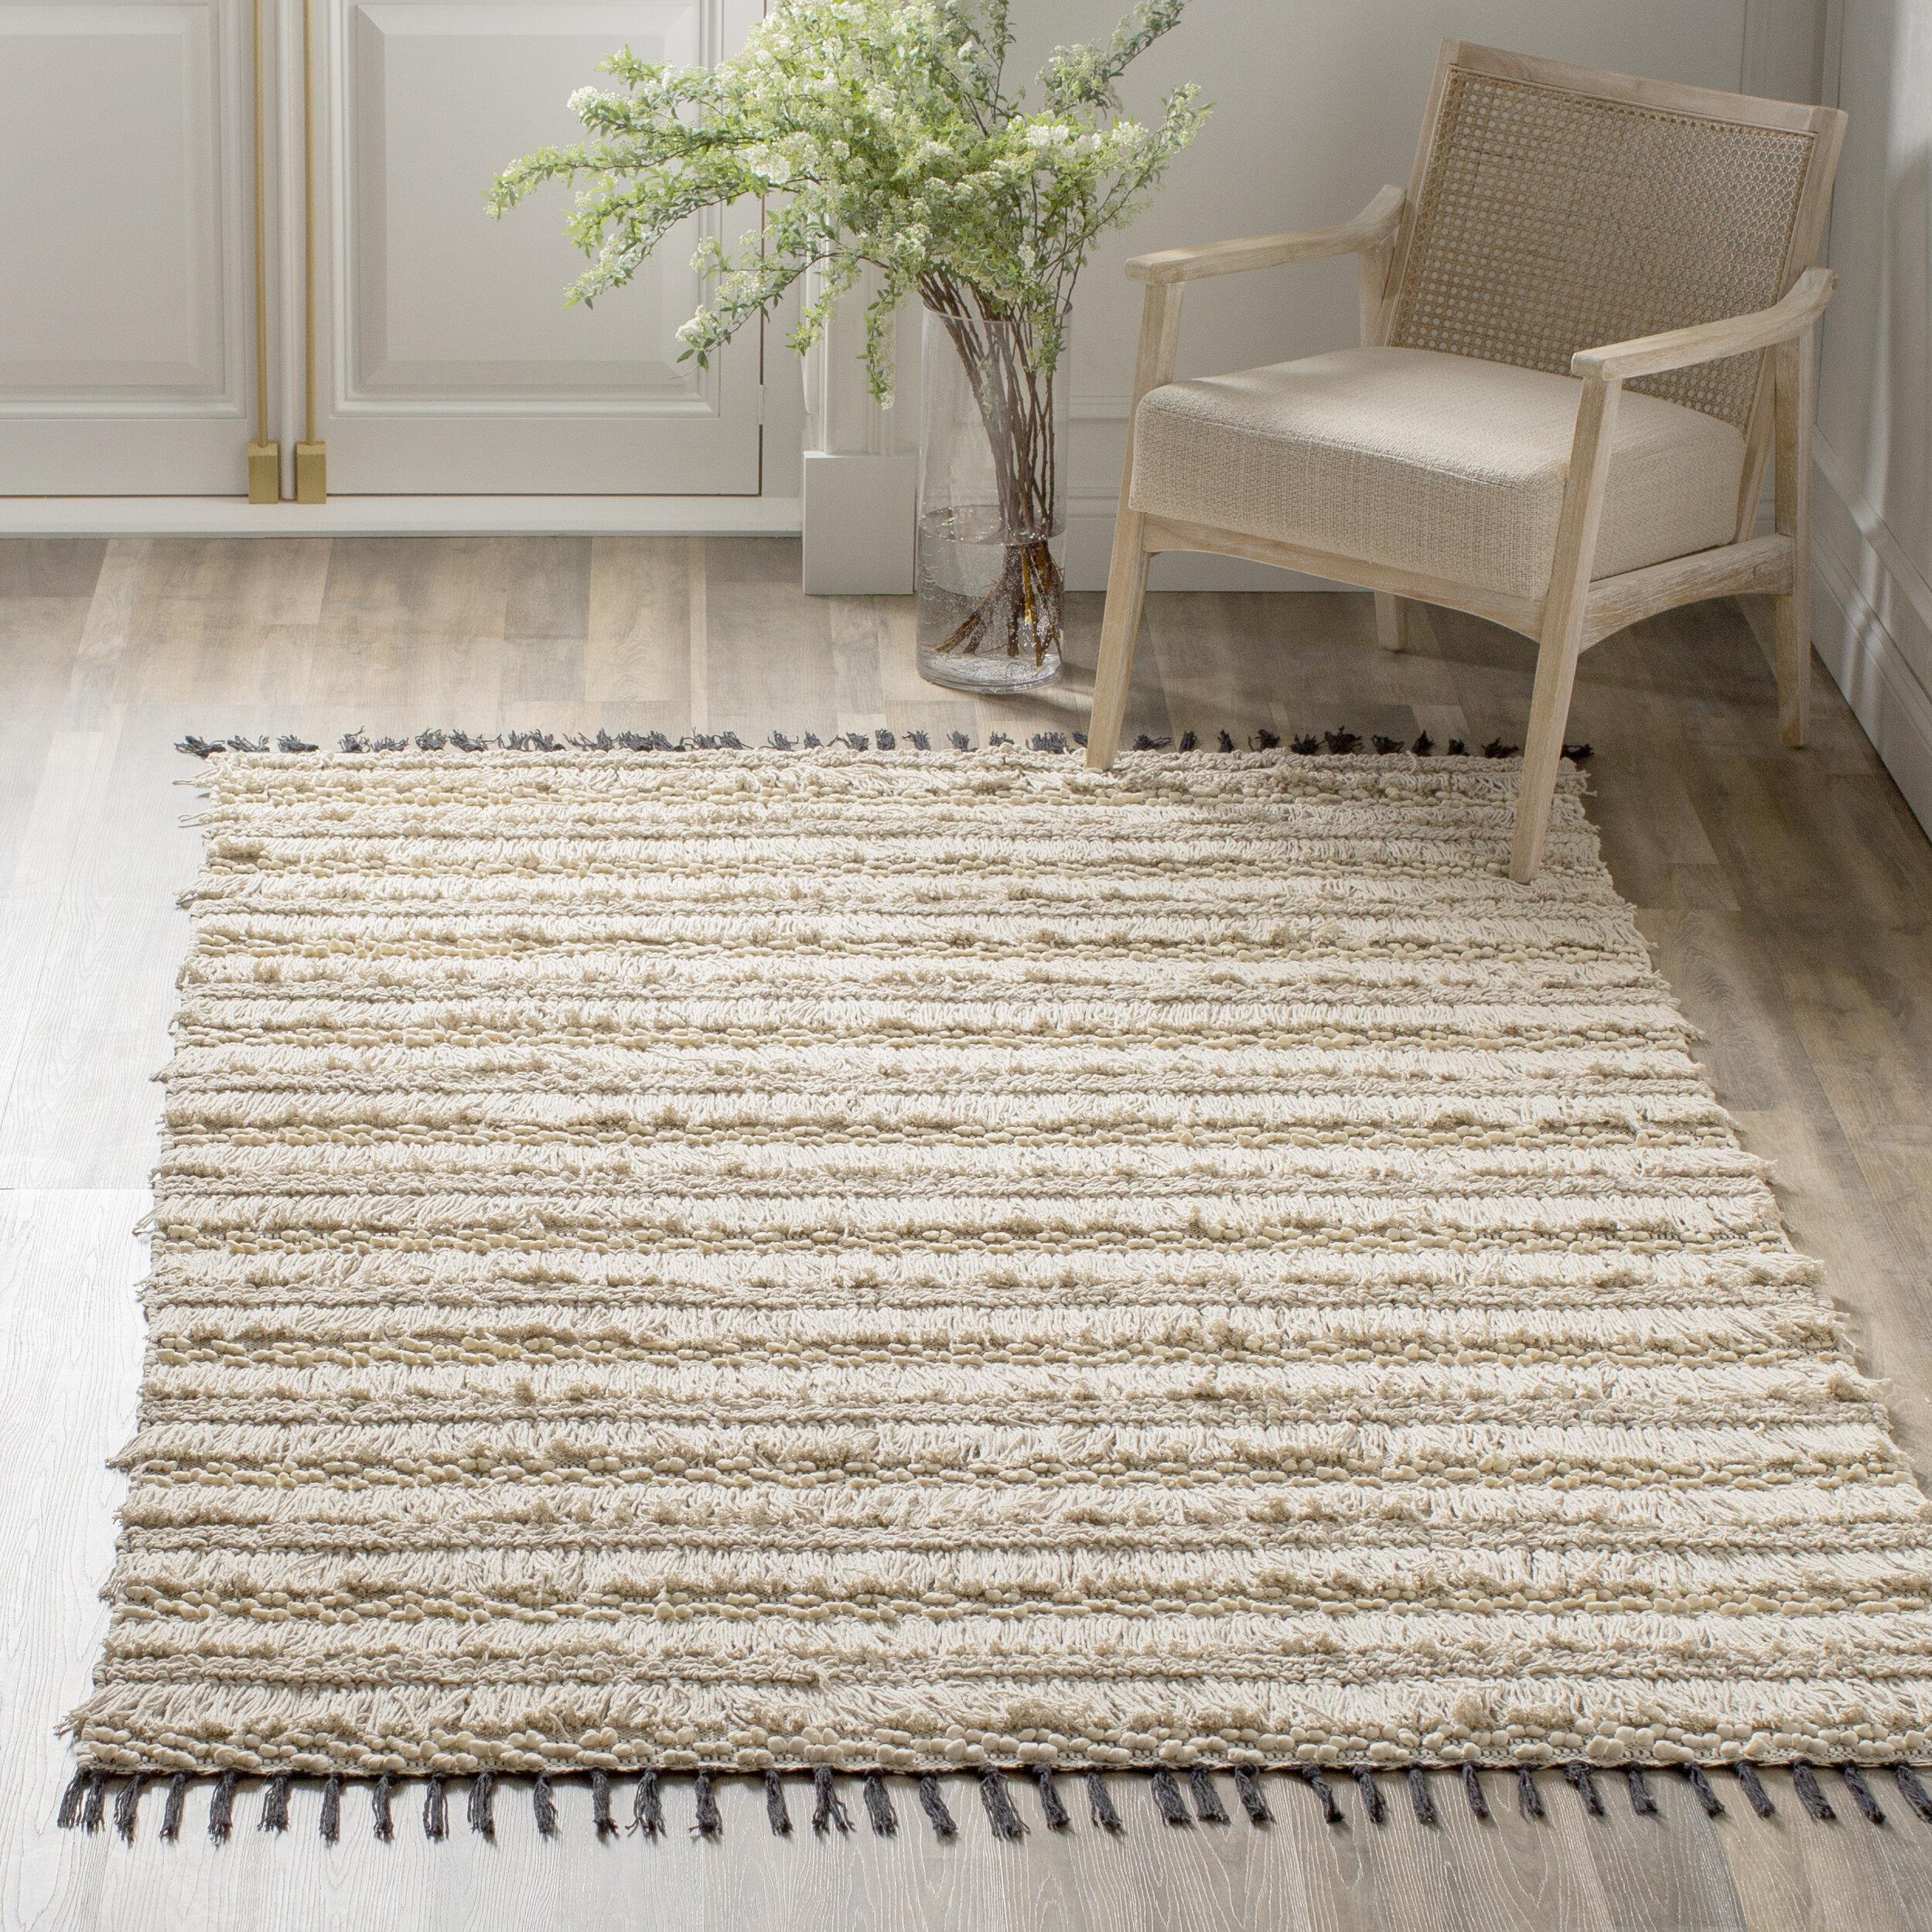 Kelly Clarkson Home Boddie Striped Handmade Cotton Beige Area Rug Reviews Wayfair